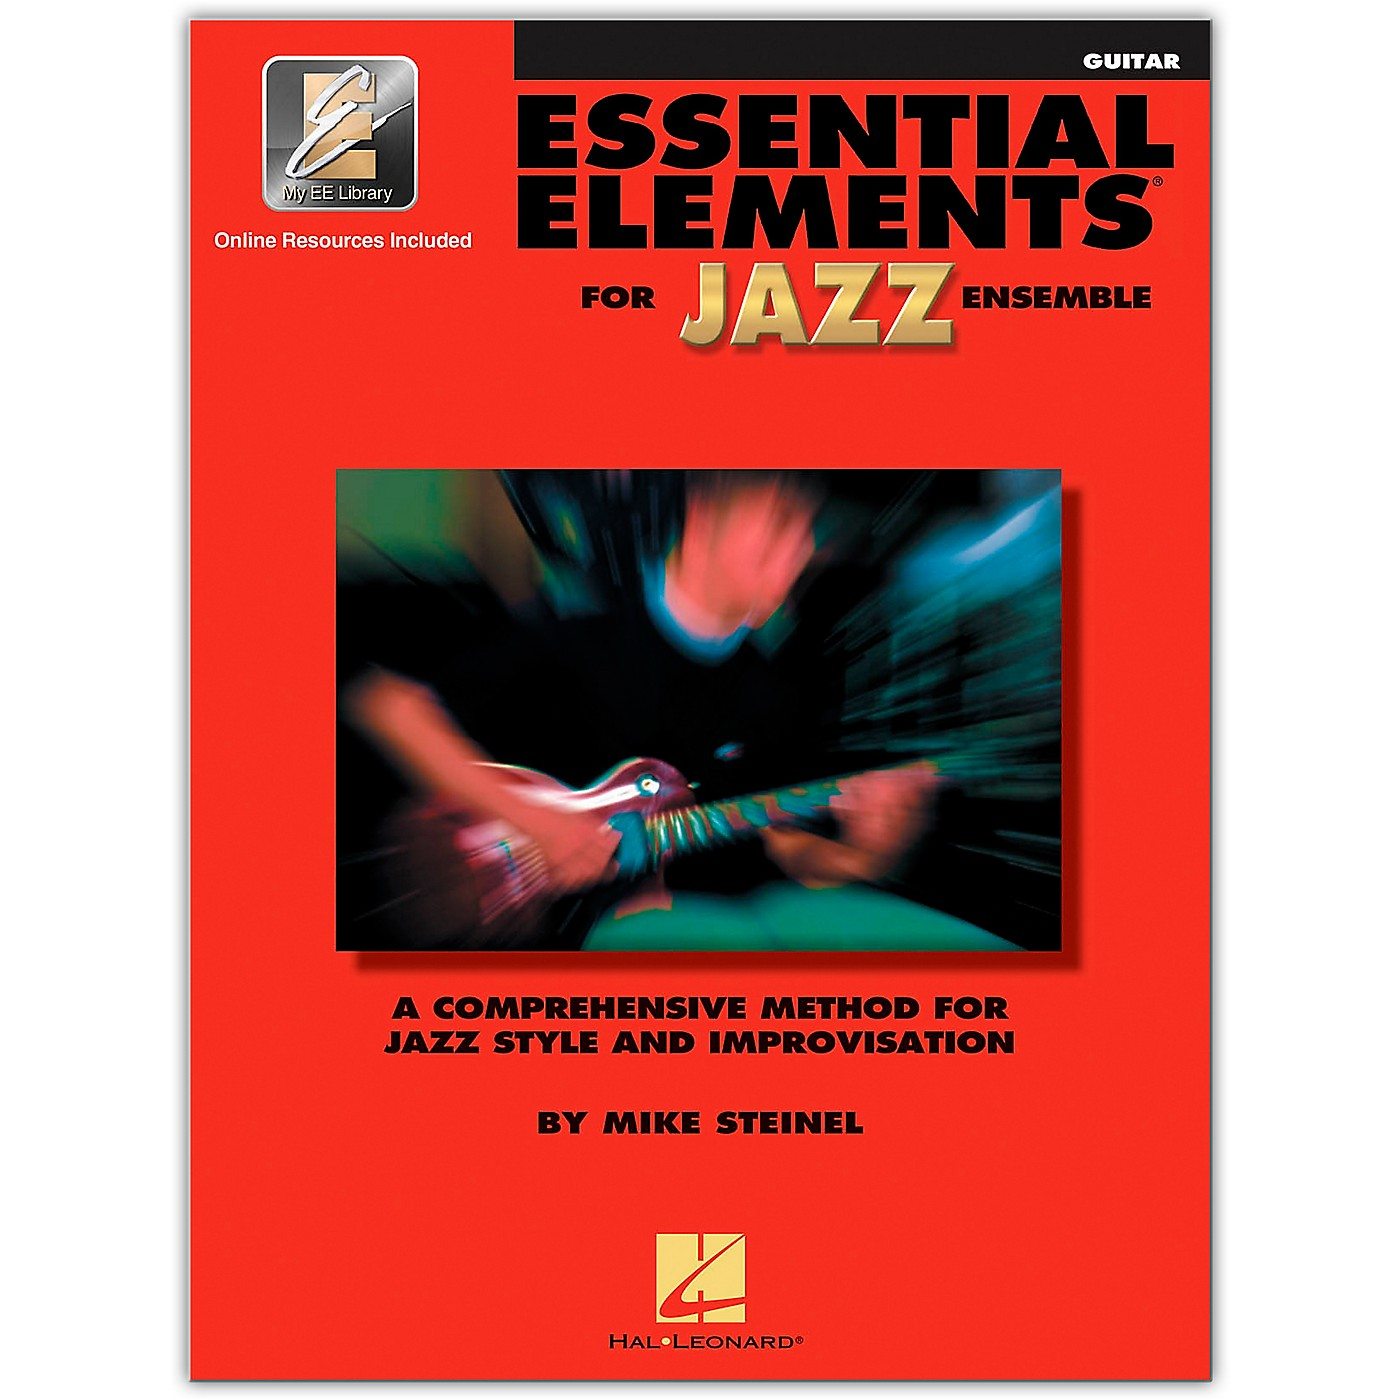 Hal Leonard Essential Elements for Jazz Ensemble - Guitar (Book/Online Audio) thumbnail